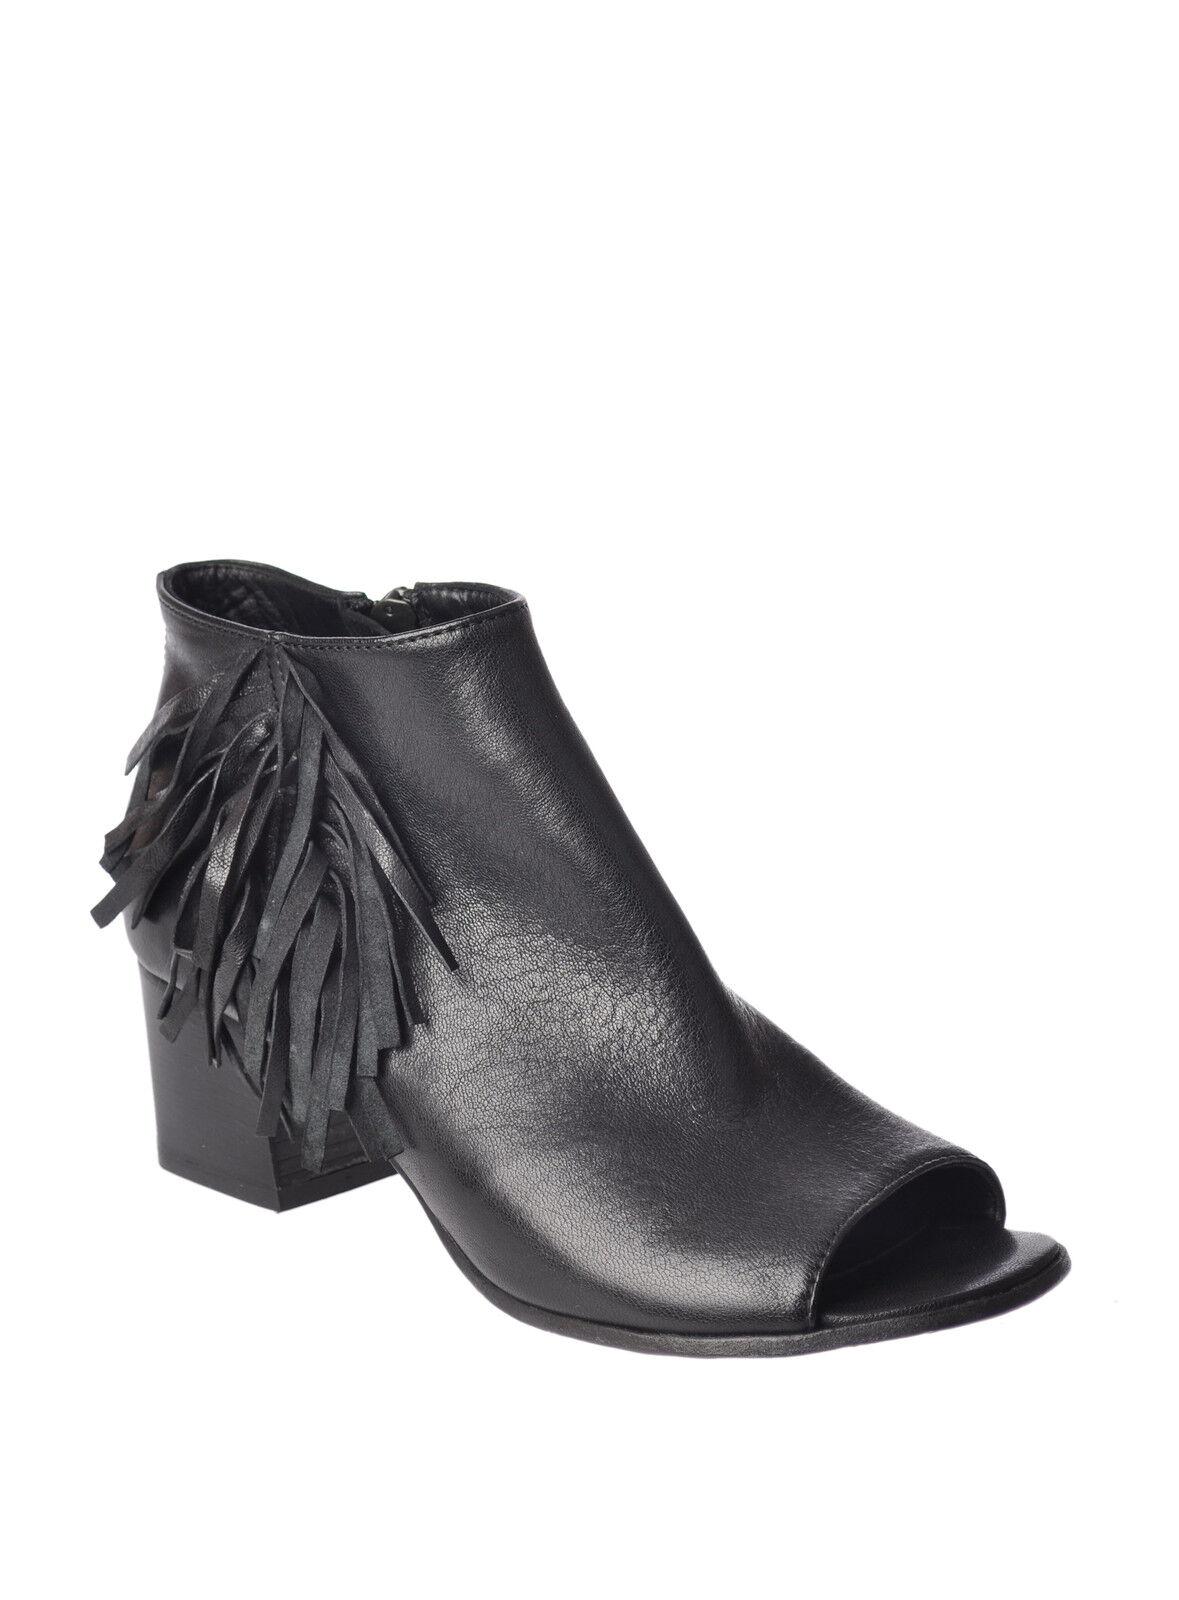 Lemarè  -  Ankle boots - Female - Black - 1893715A183948